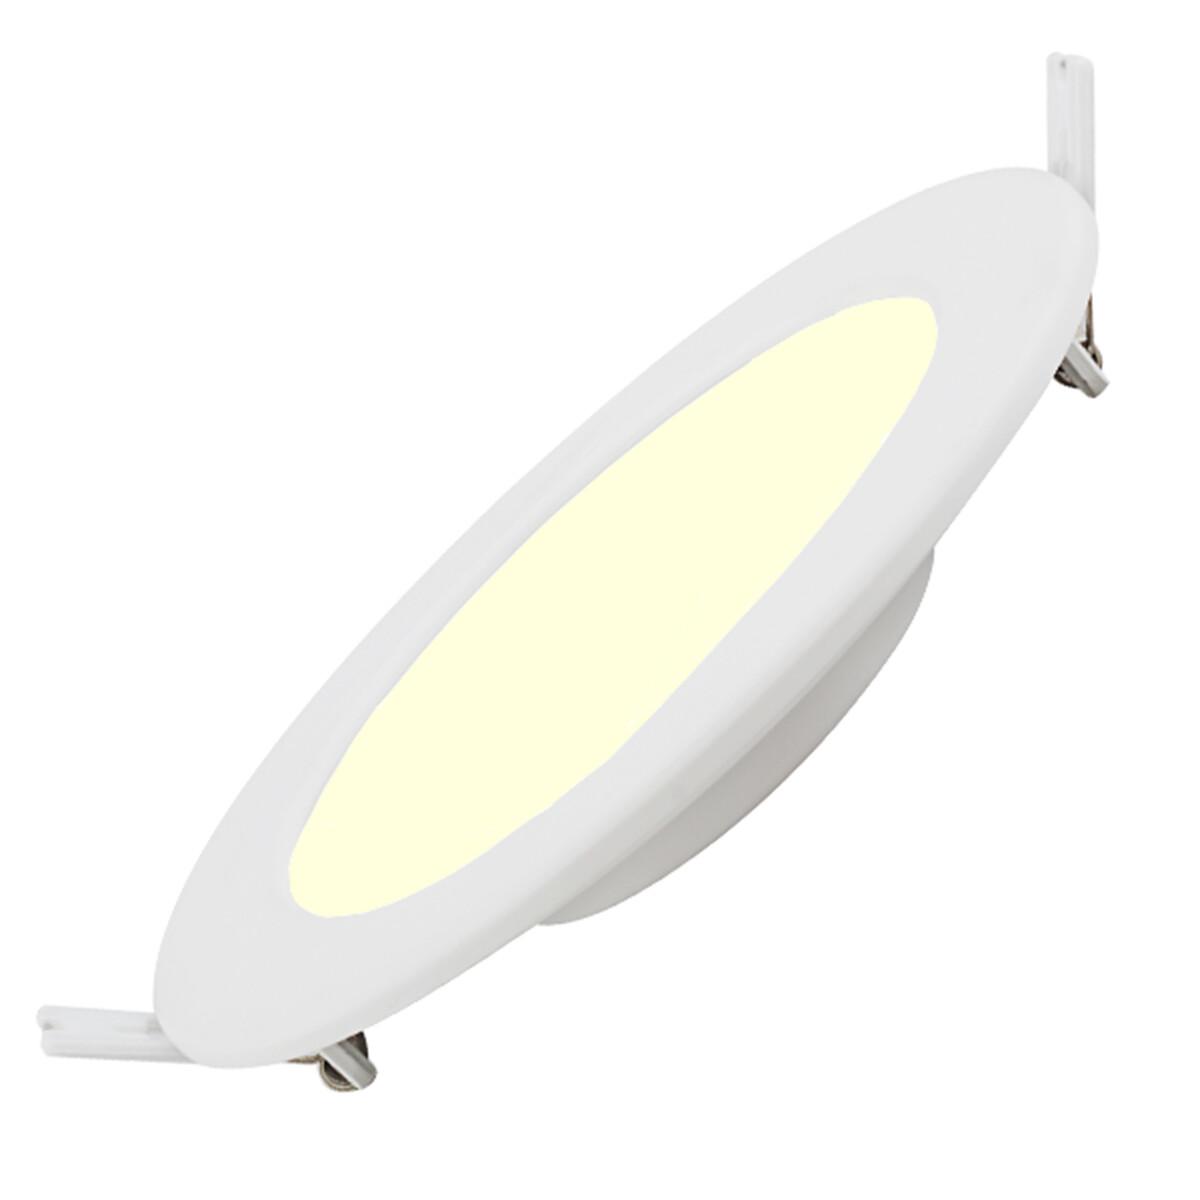 LED Downlight Slim Pro - Aigi - Inbouw Rond 6W - Warm Wit 3000K - Mat Wit - Kunststof - Ø115mm